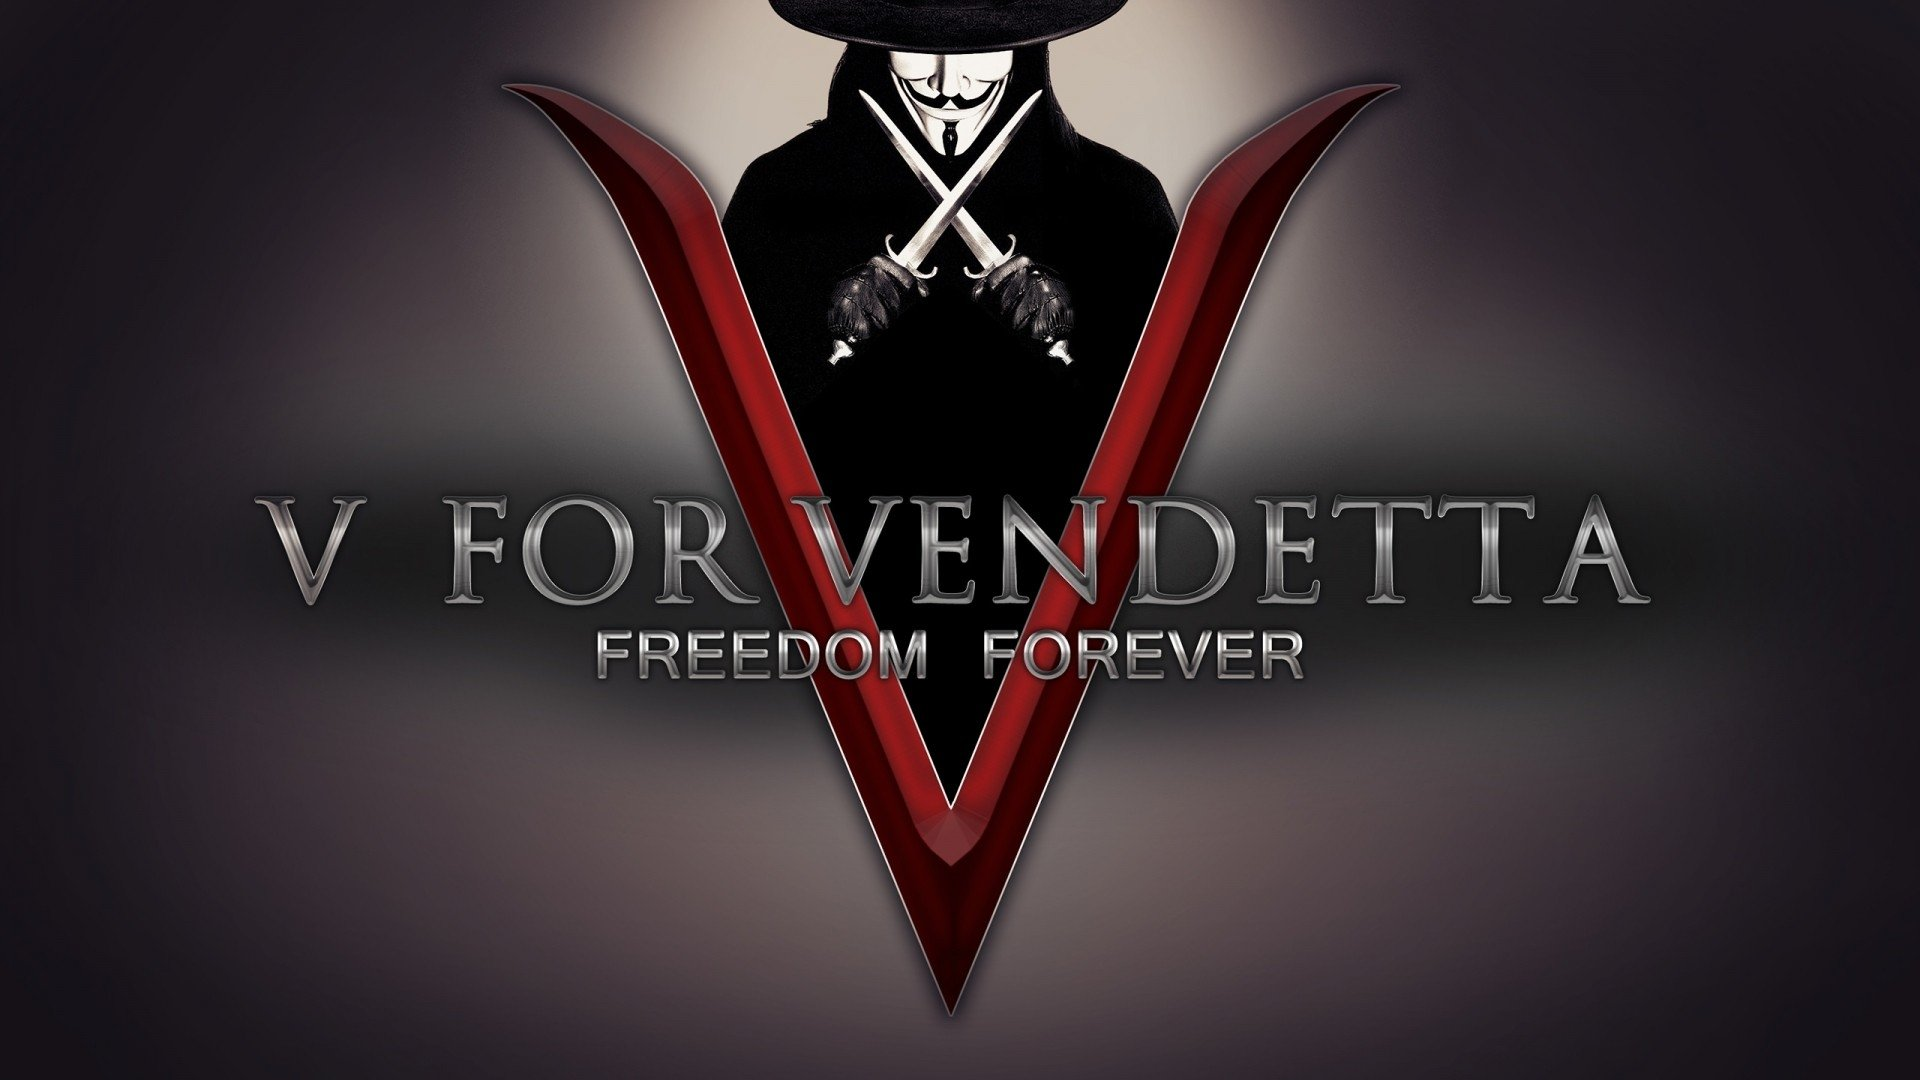 95 V For Vendetta HD Wallpapers